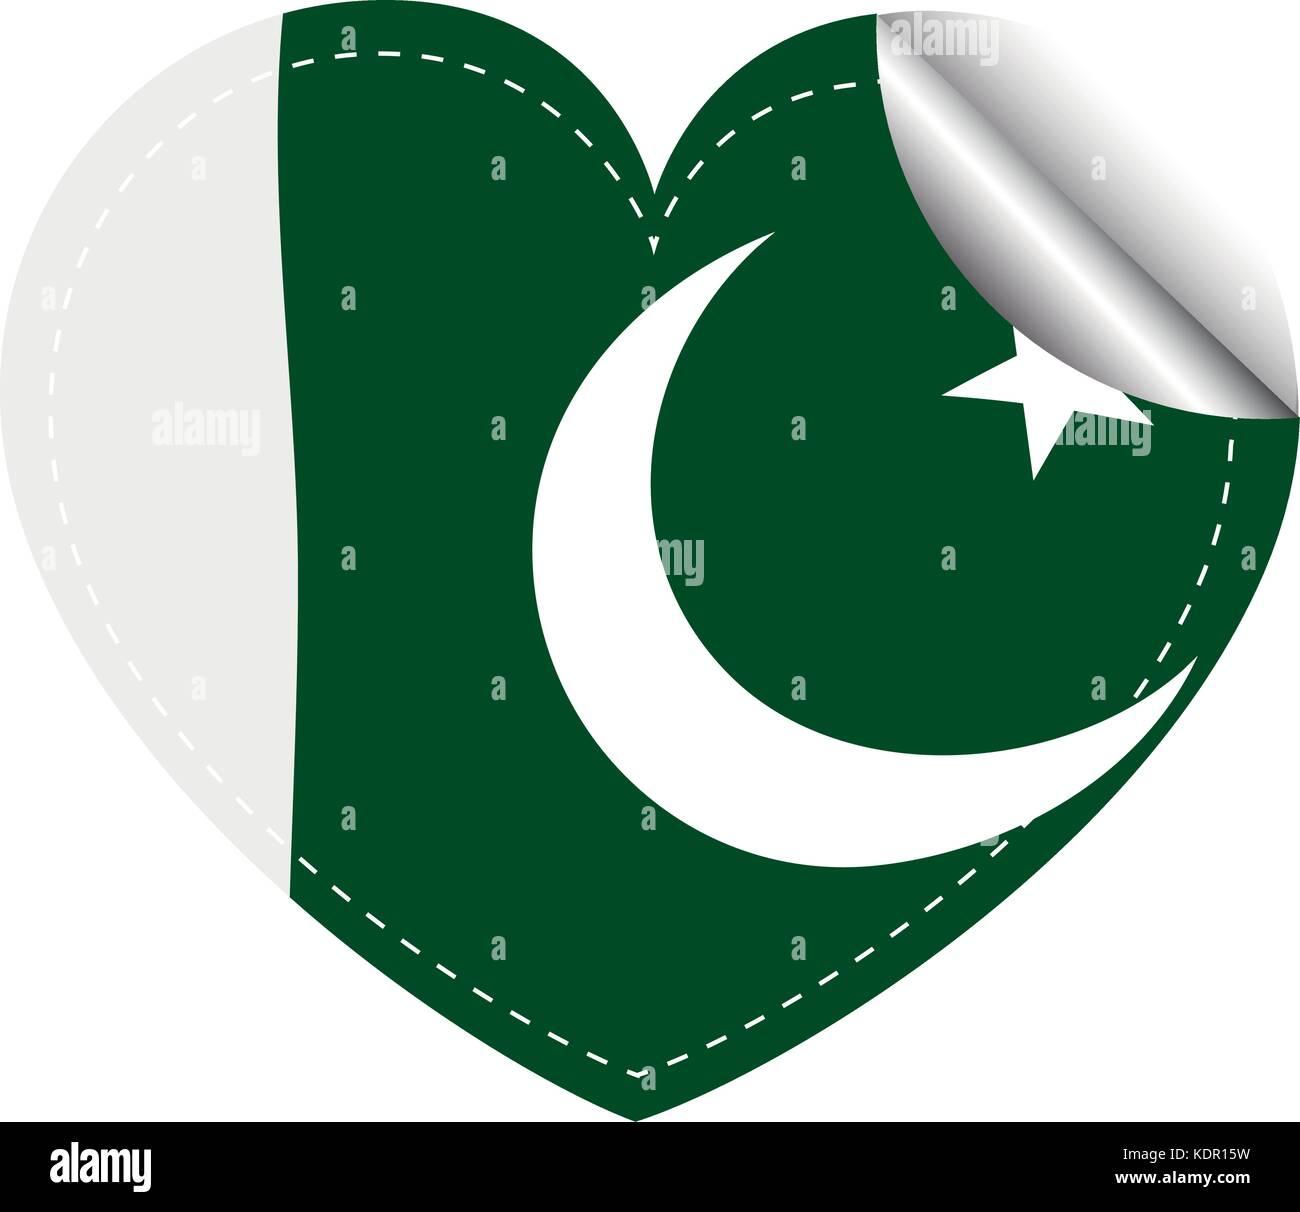 Sticker design for pakistan flag illustration